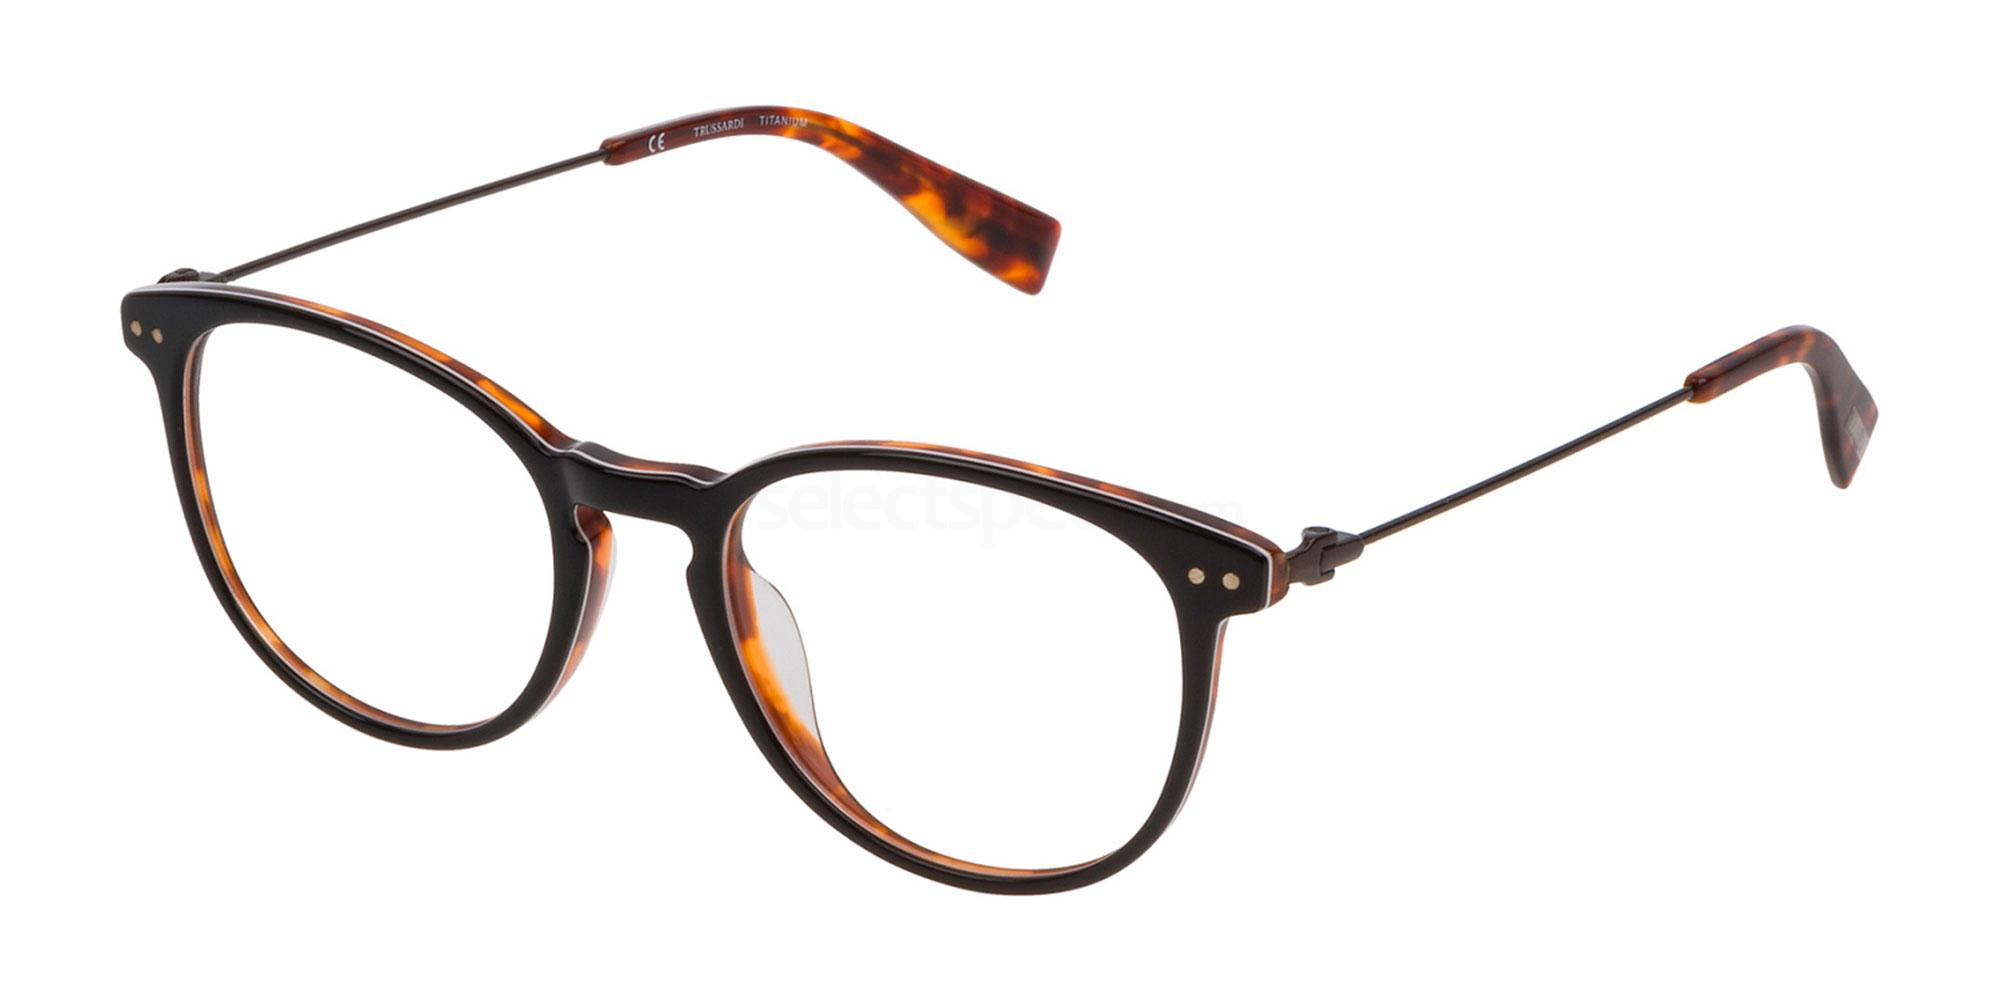 02A1 VTR245 Glasses, Trussardi